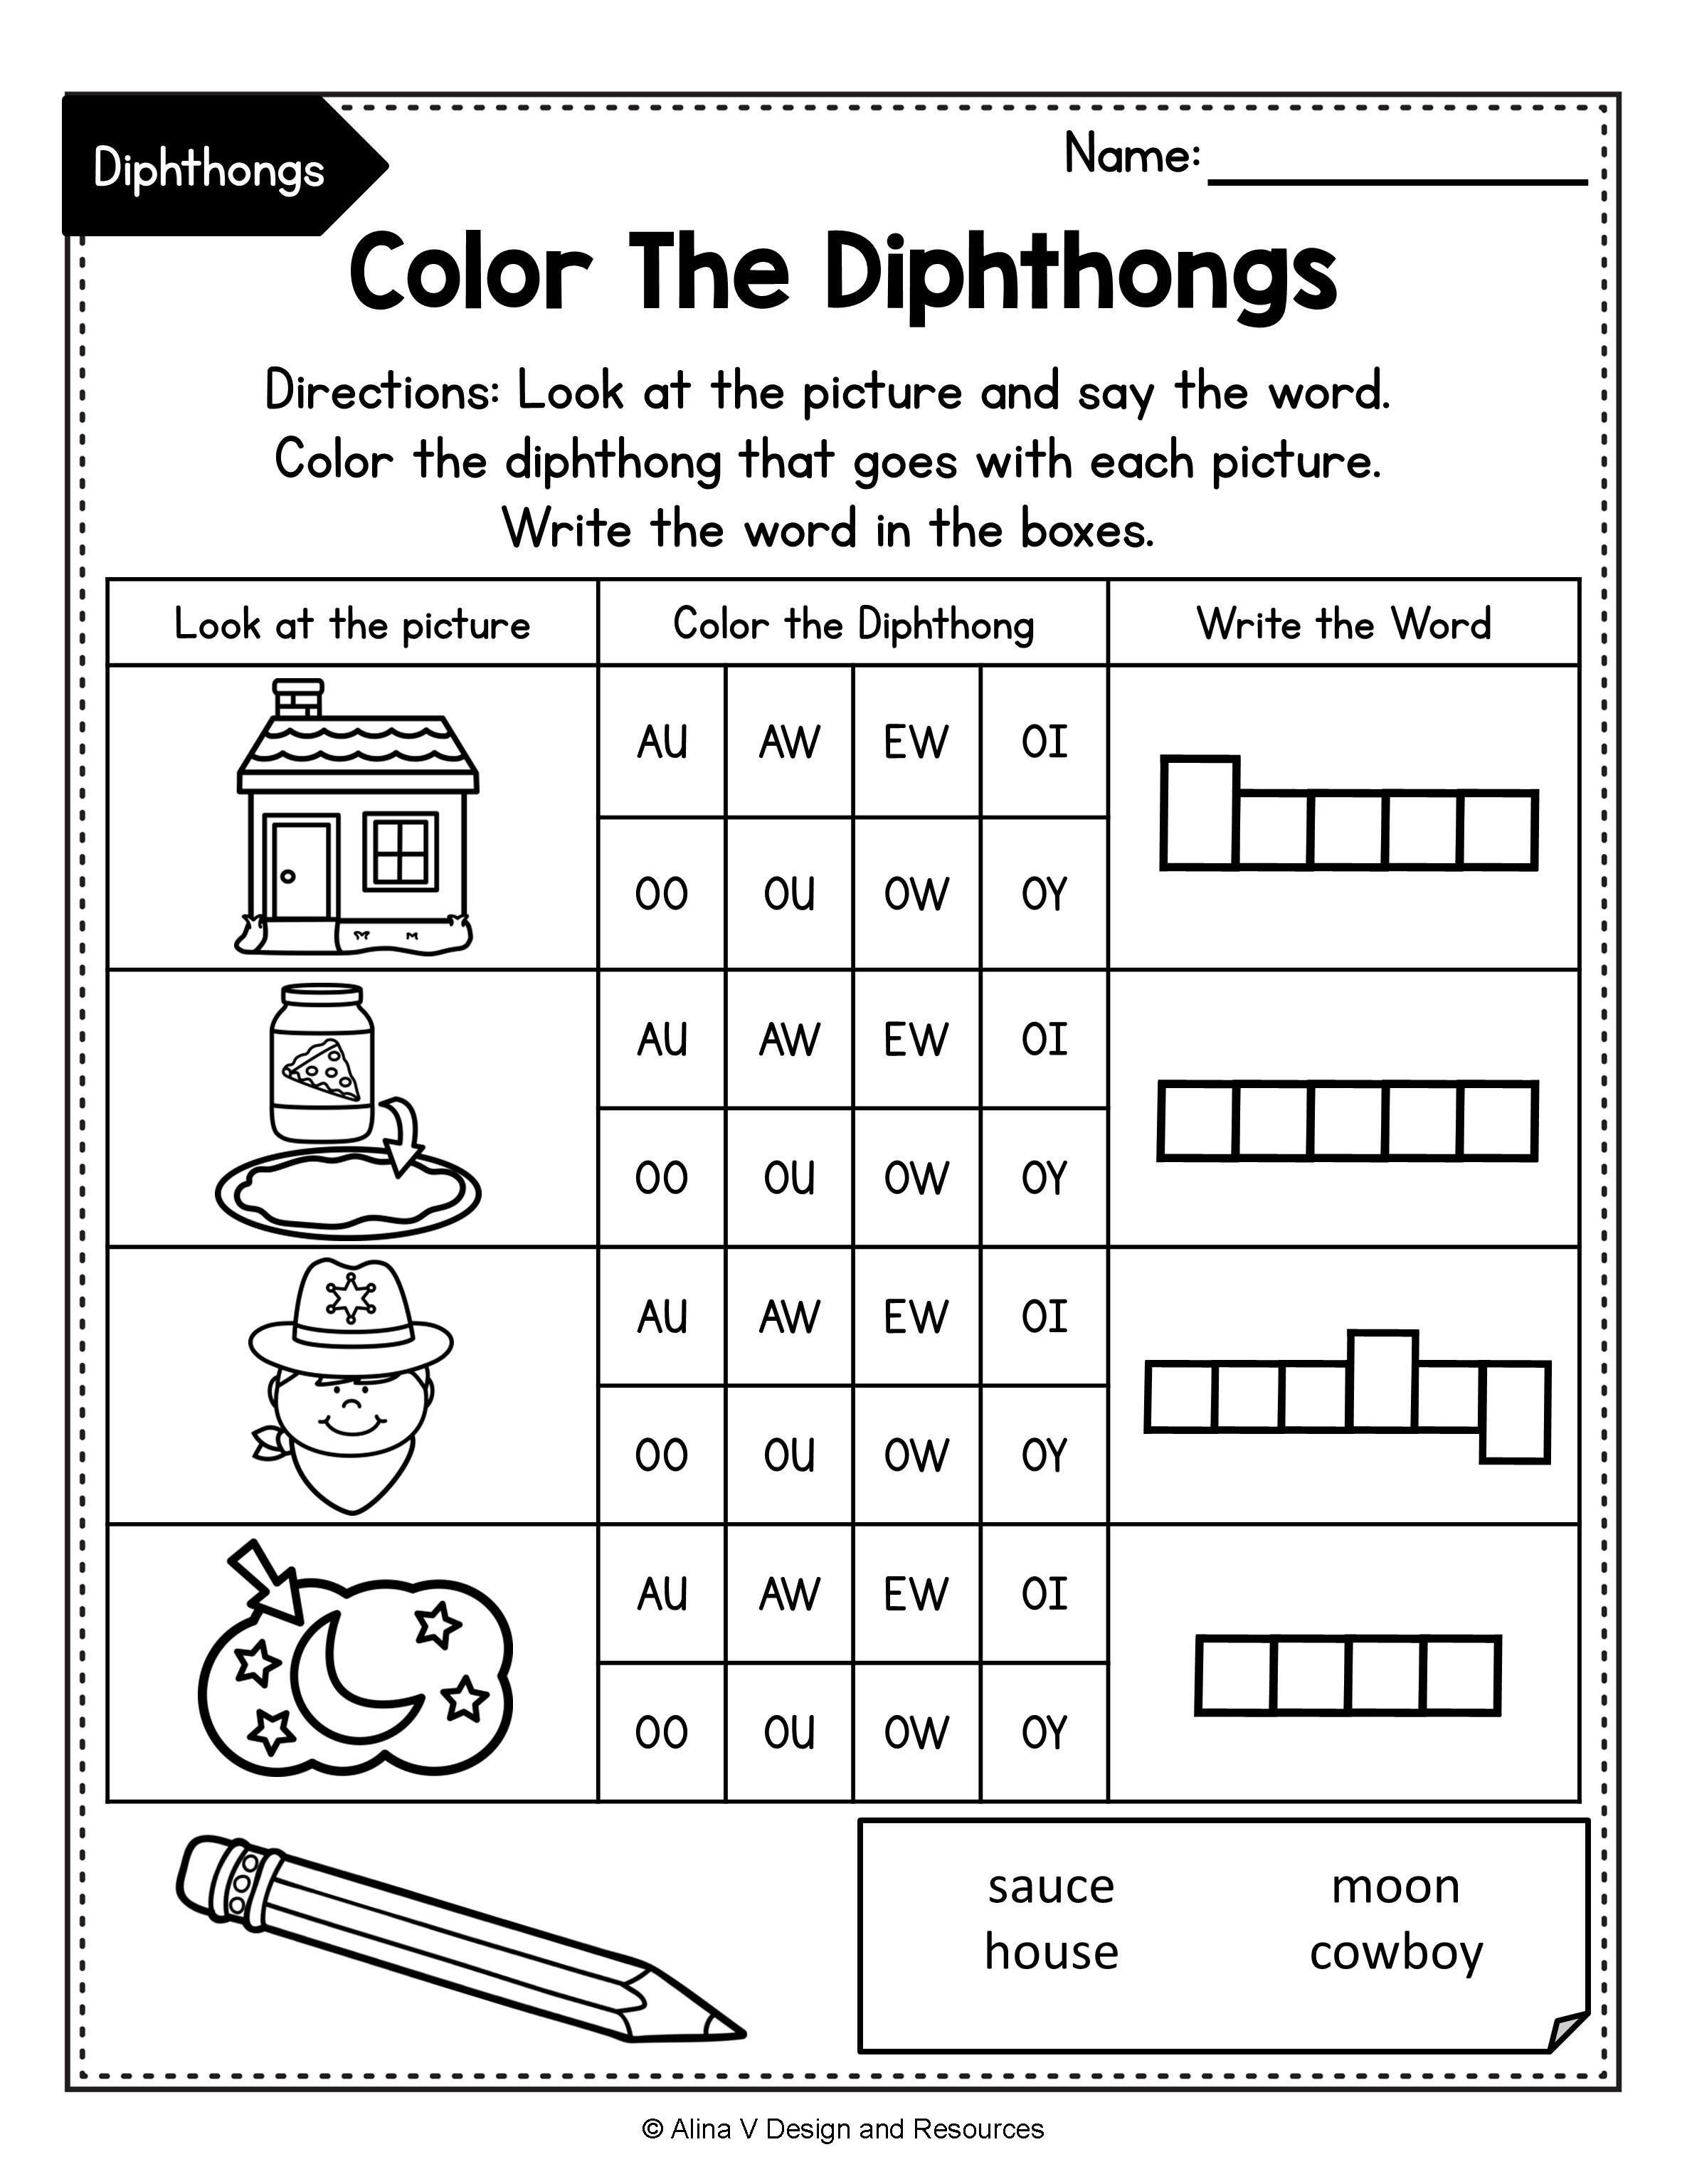 Diphthong Activities Bundle Diphthong Activities Vowel Diphthongs Worksheets In 2020 Phonics Activities Phonics Phonics Worksheets